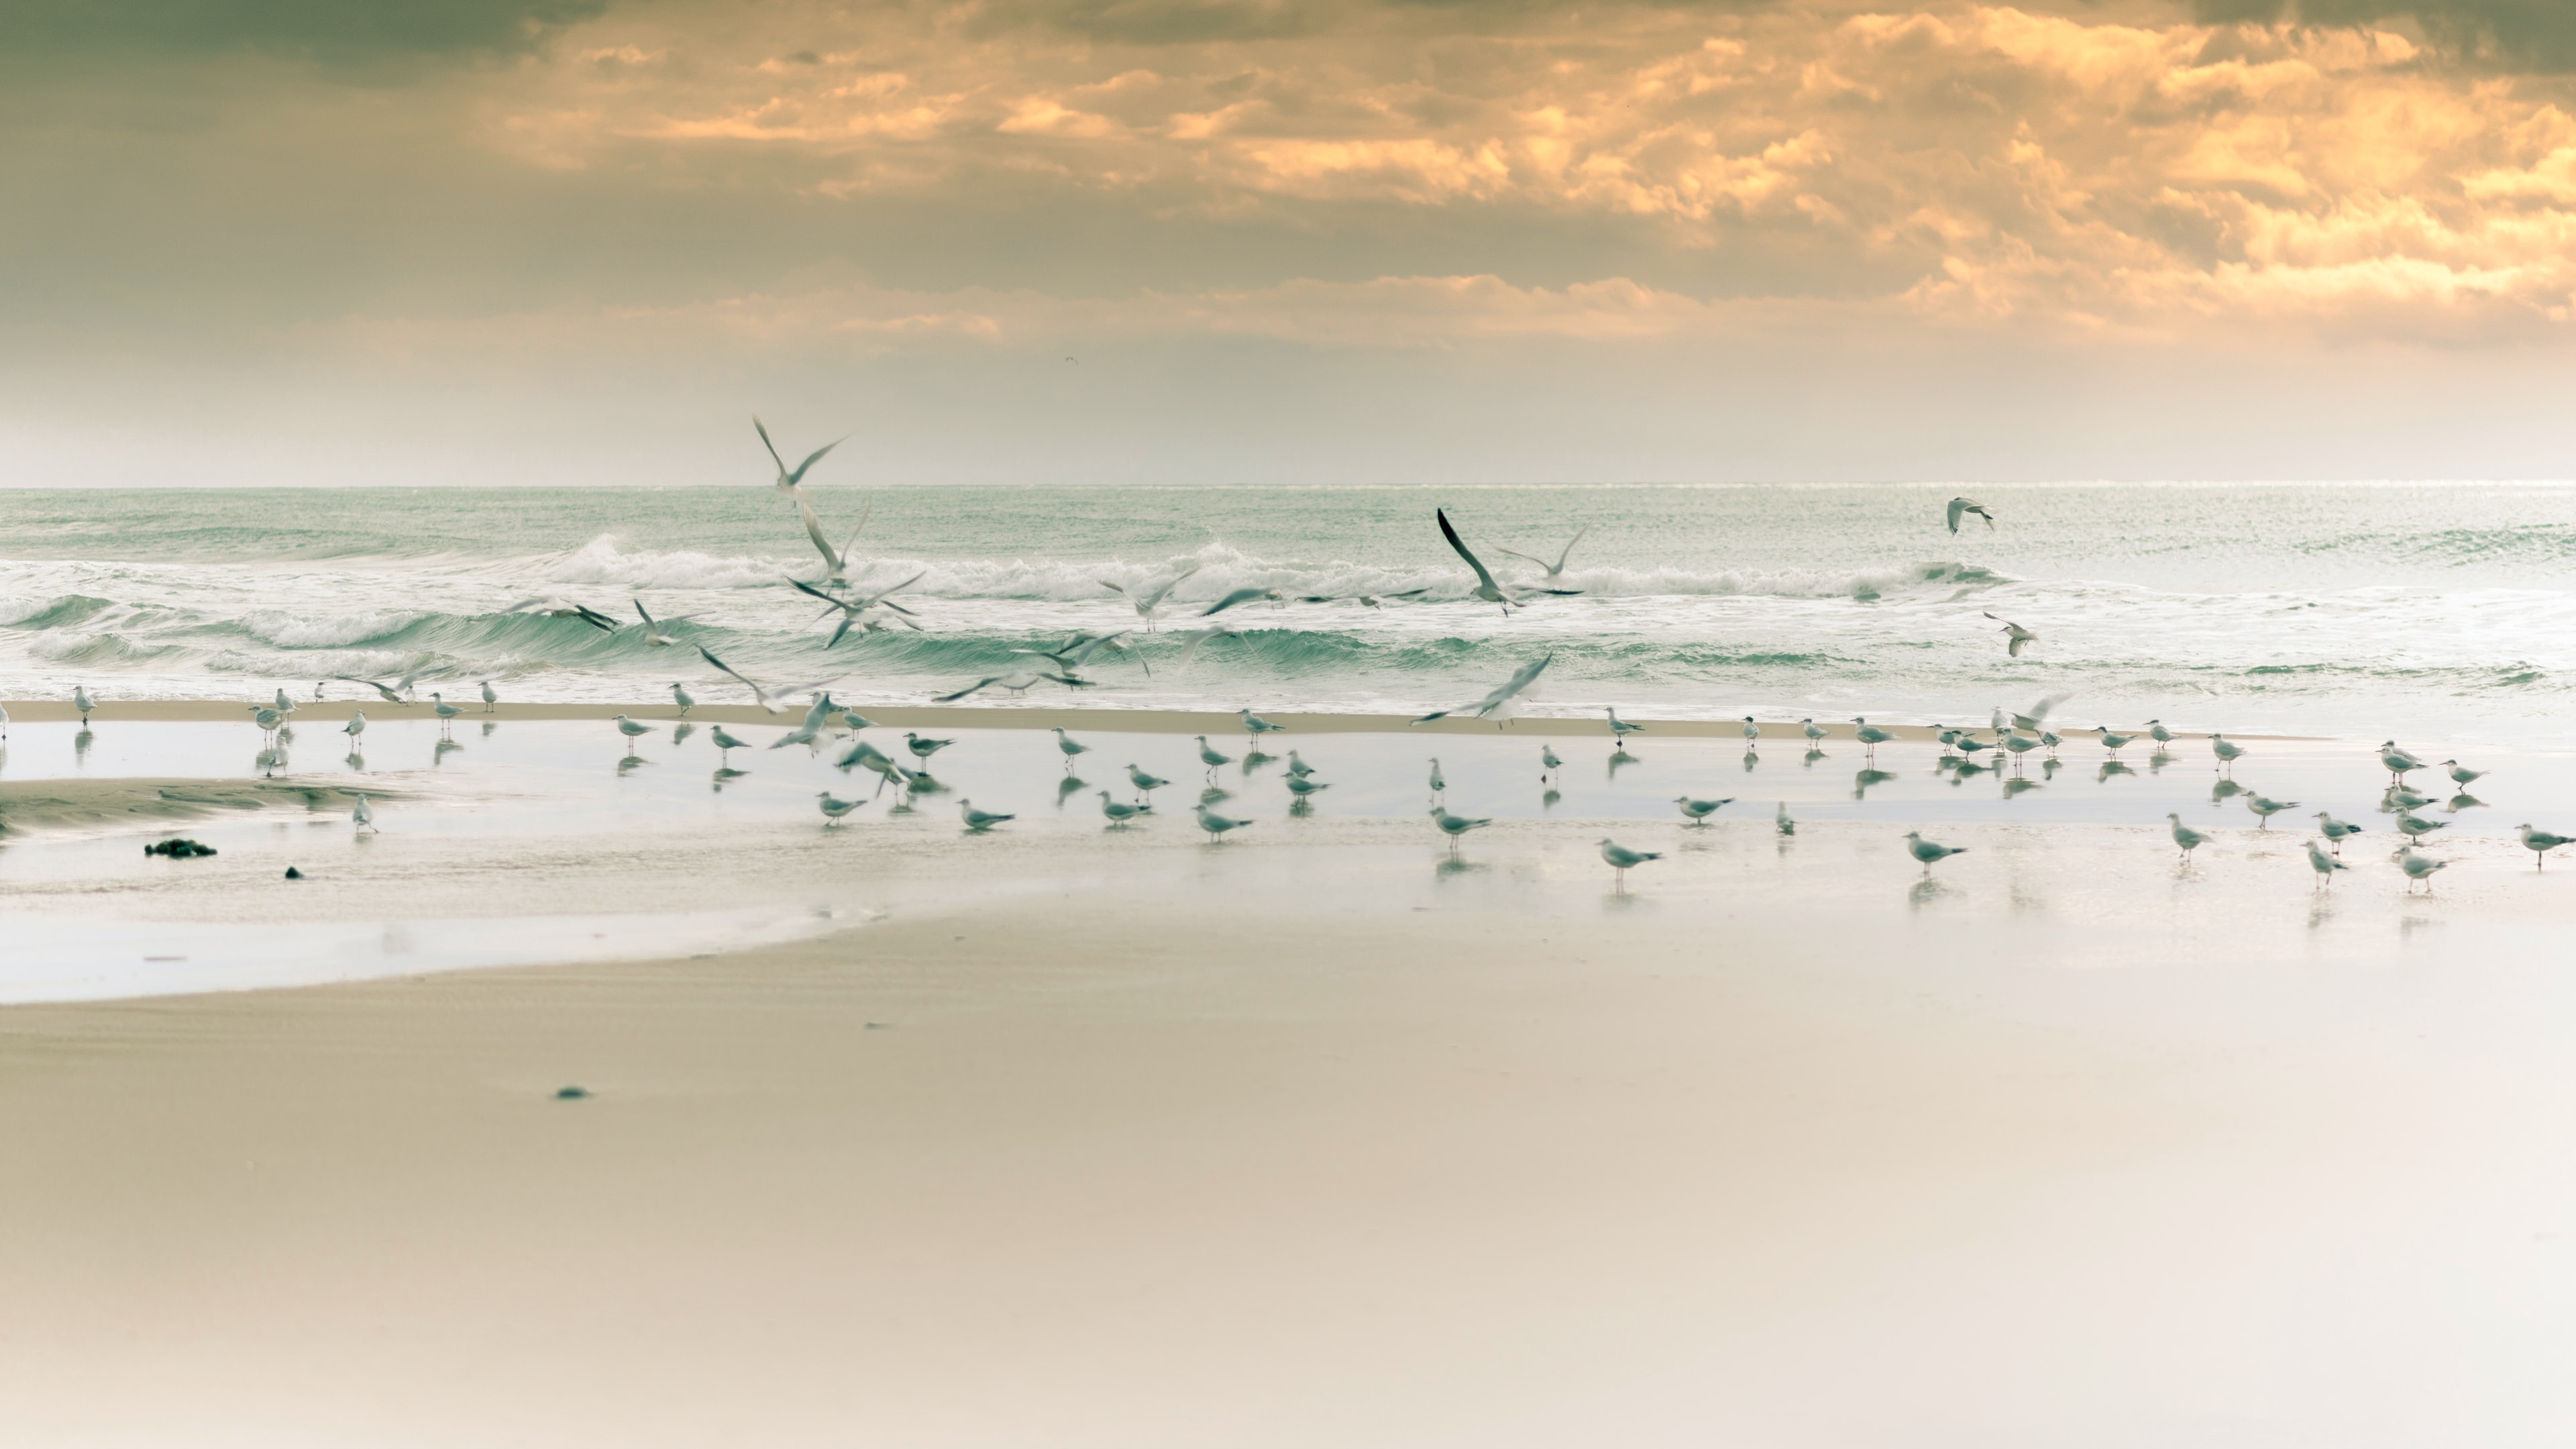 flock of birds on shore